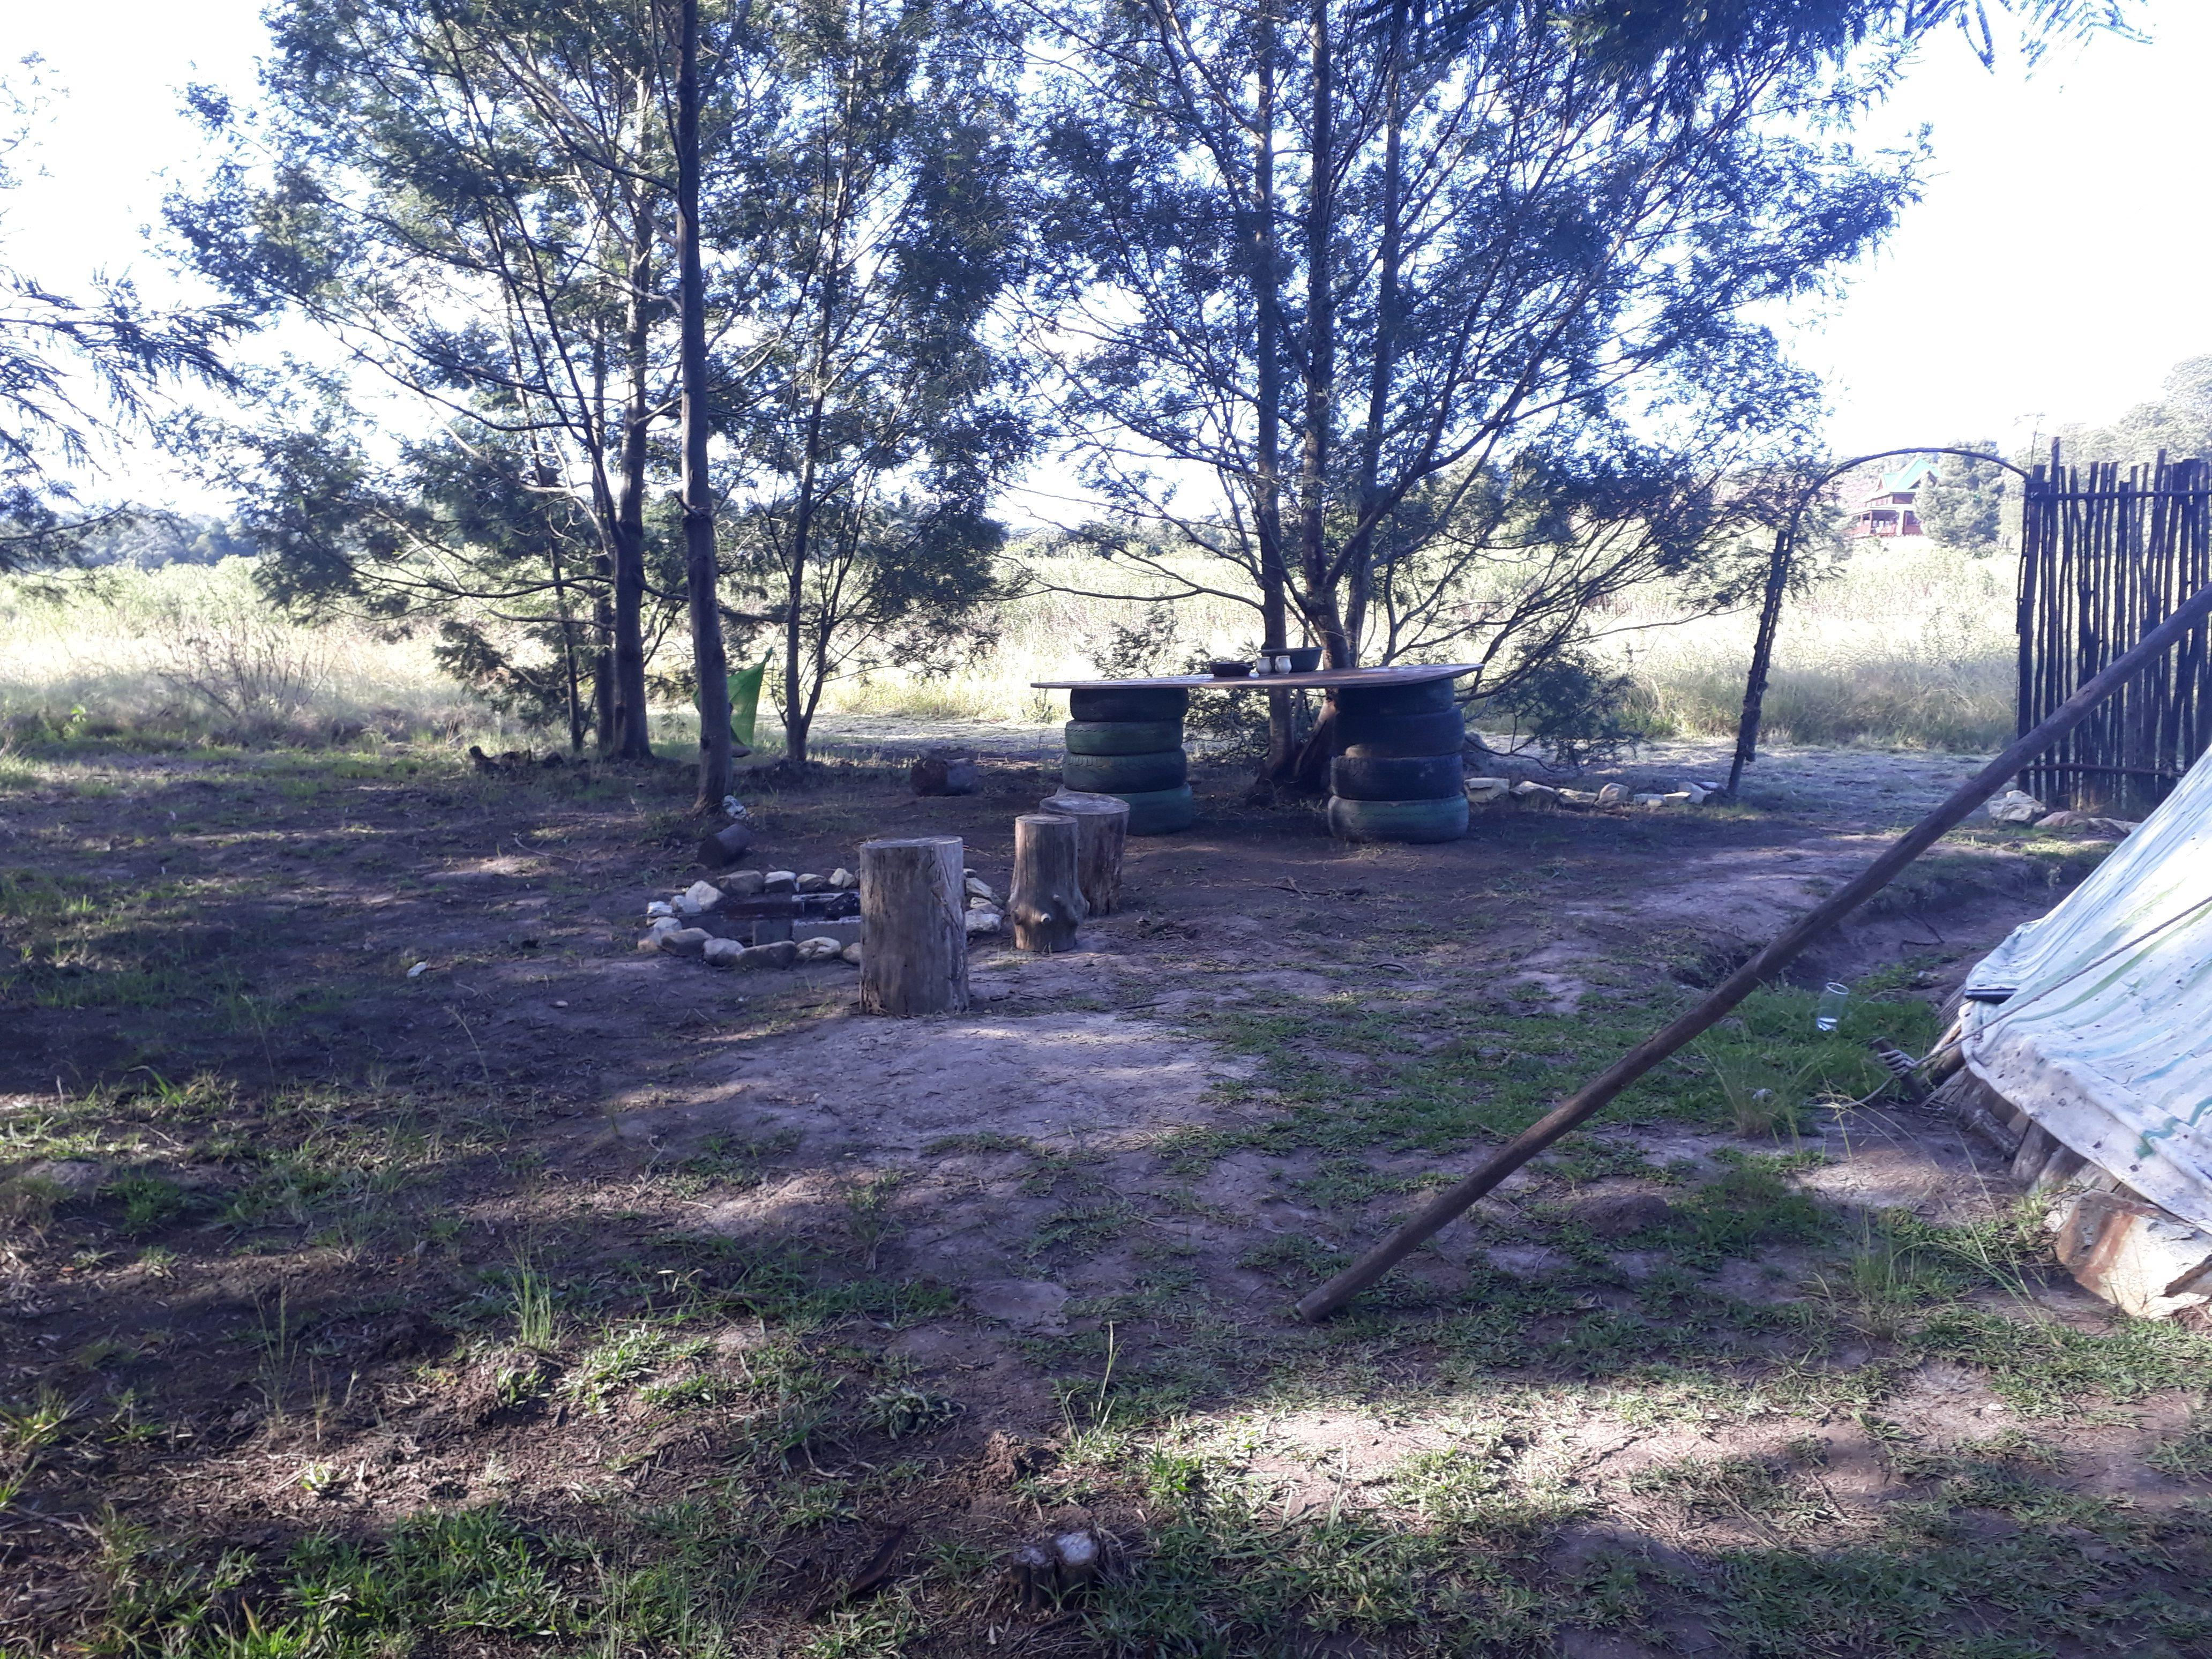 camping knysna | glamping knysna | western cape | camping knysna camp site